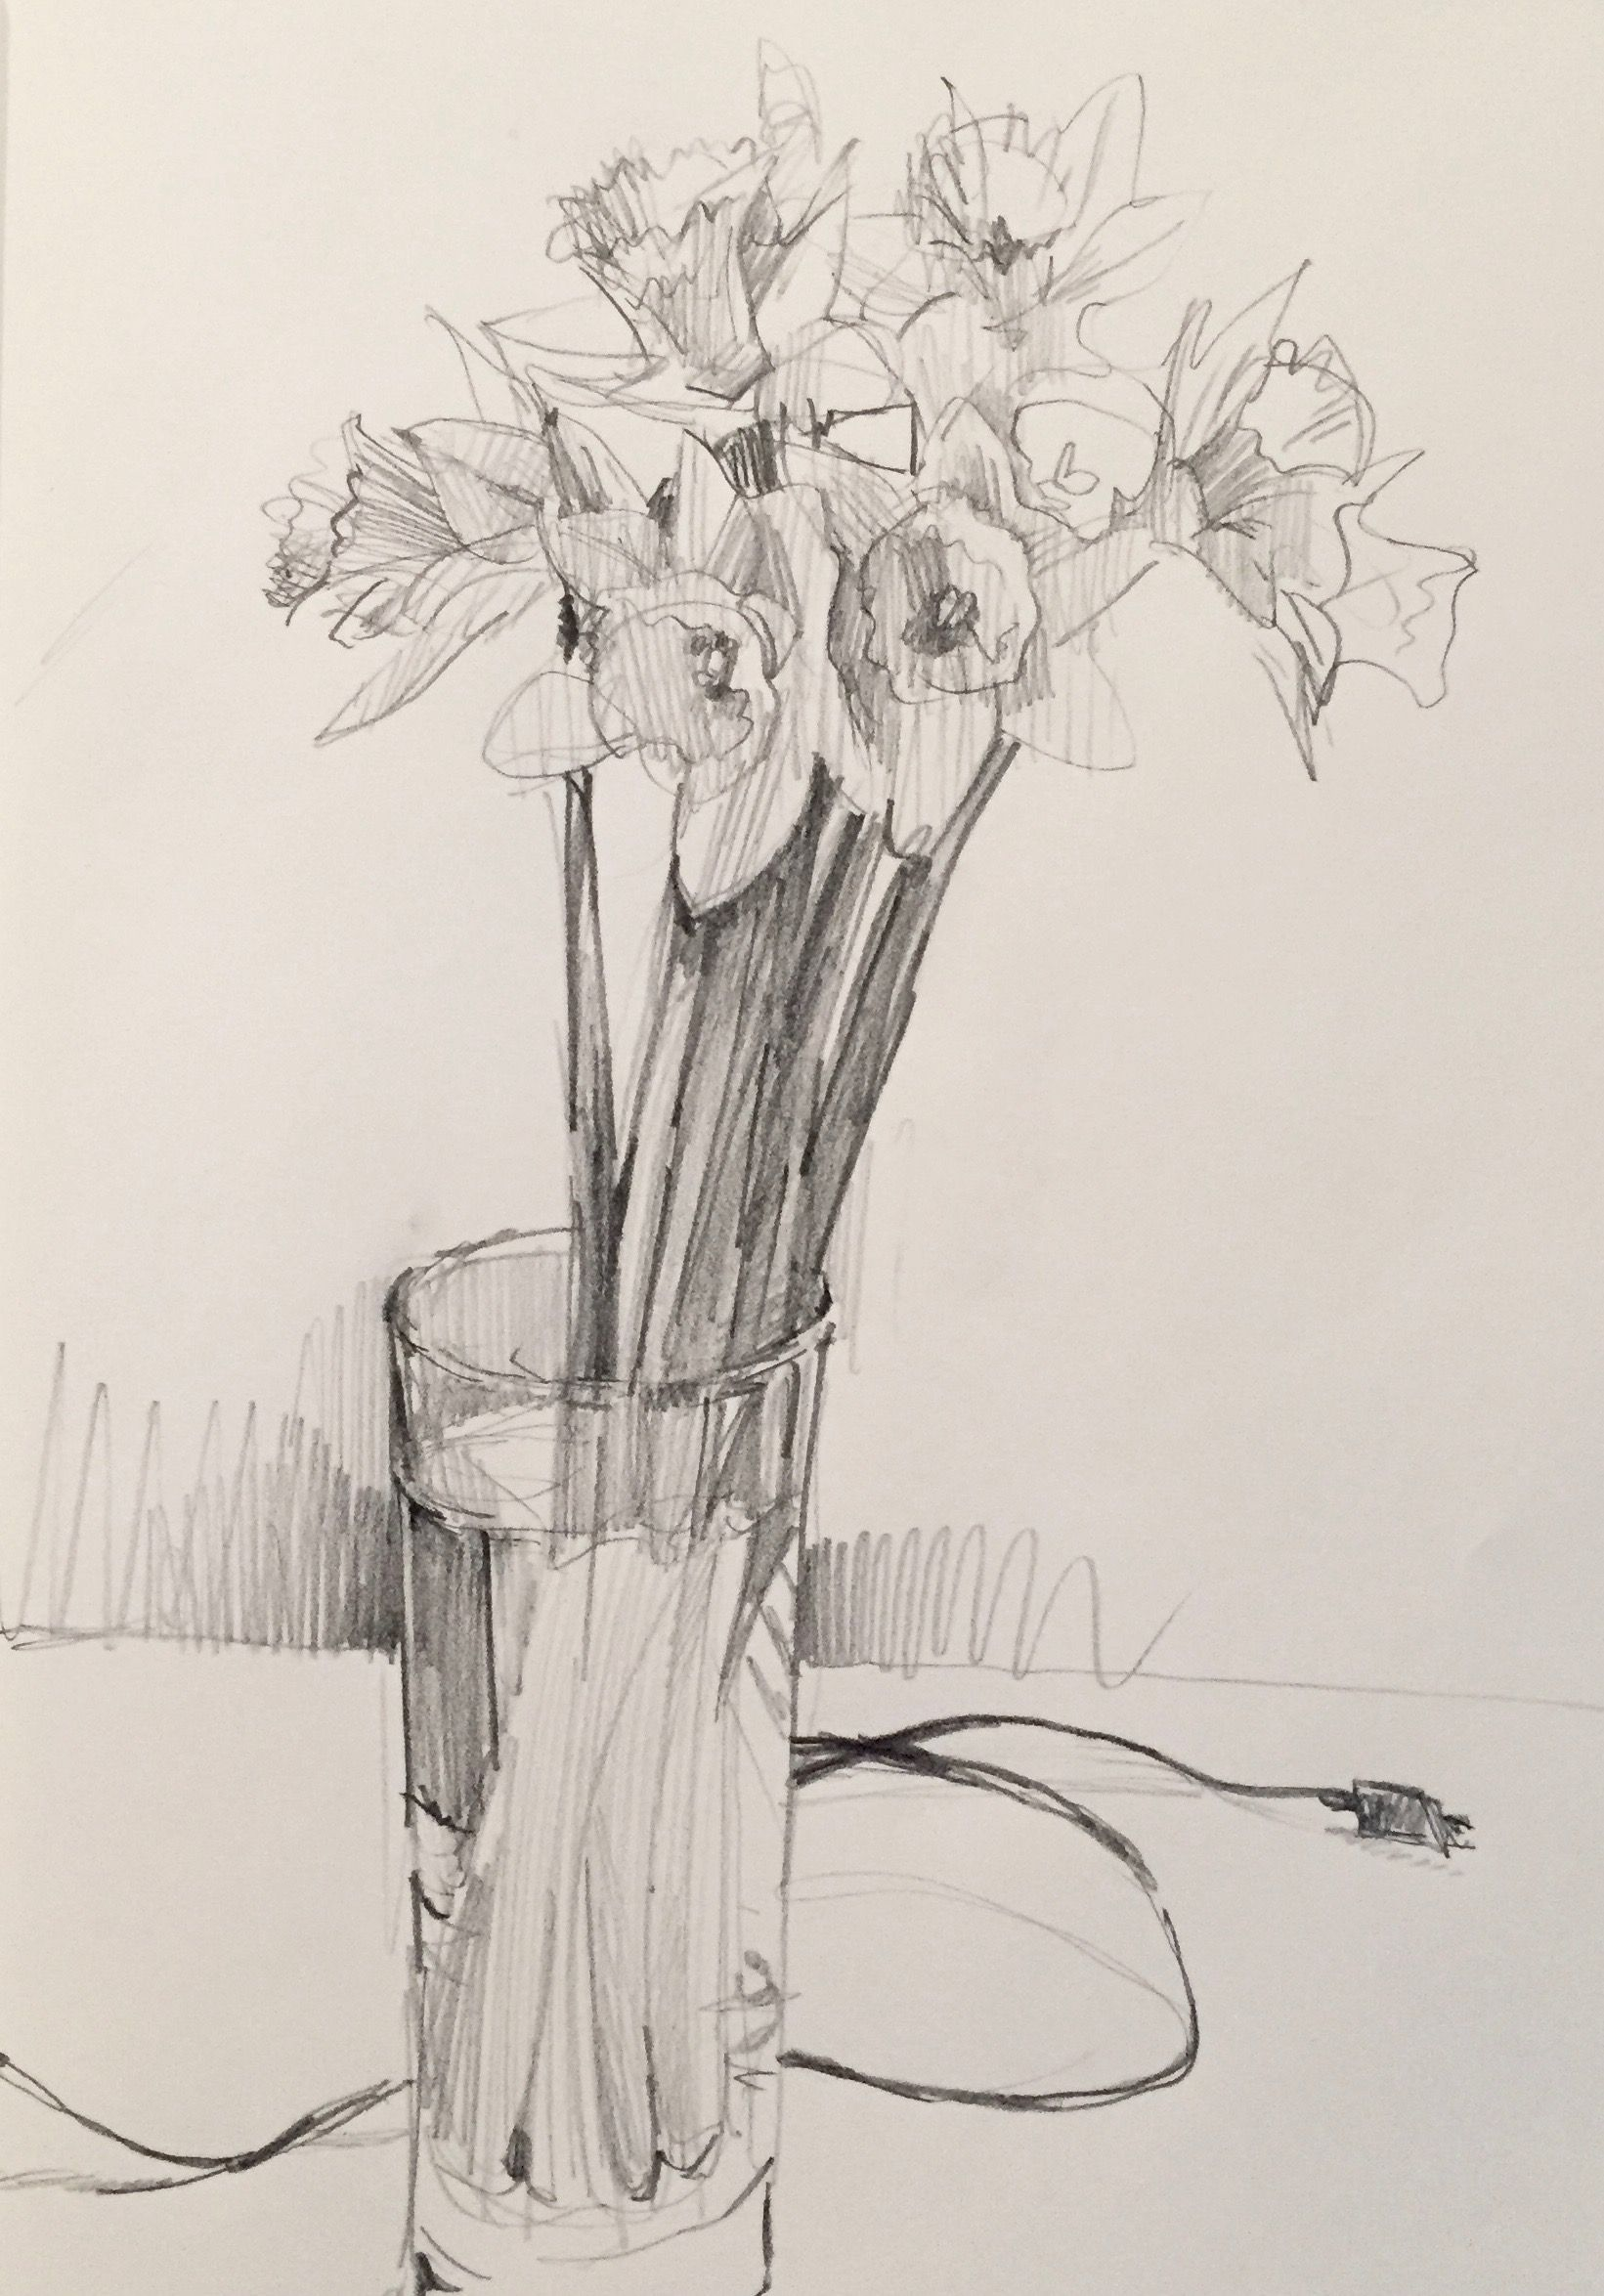 daffodils. #sketch #sketchbook #drawing #art by Sarah Sedwick. 3.19.16.